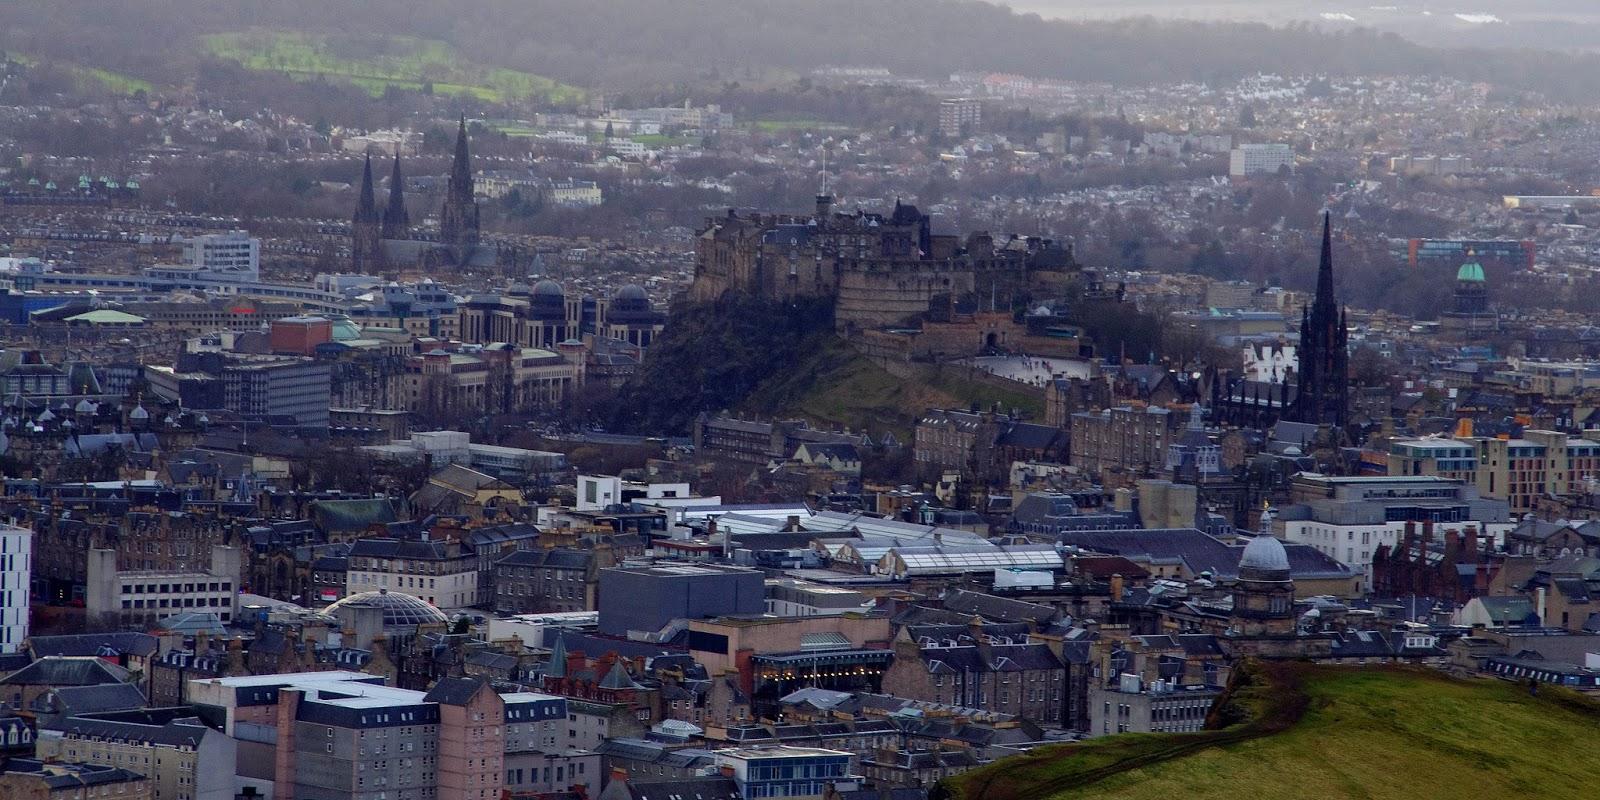 Edinburgh Scotland from Arthurs Seat